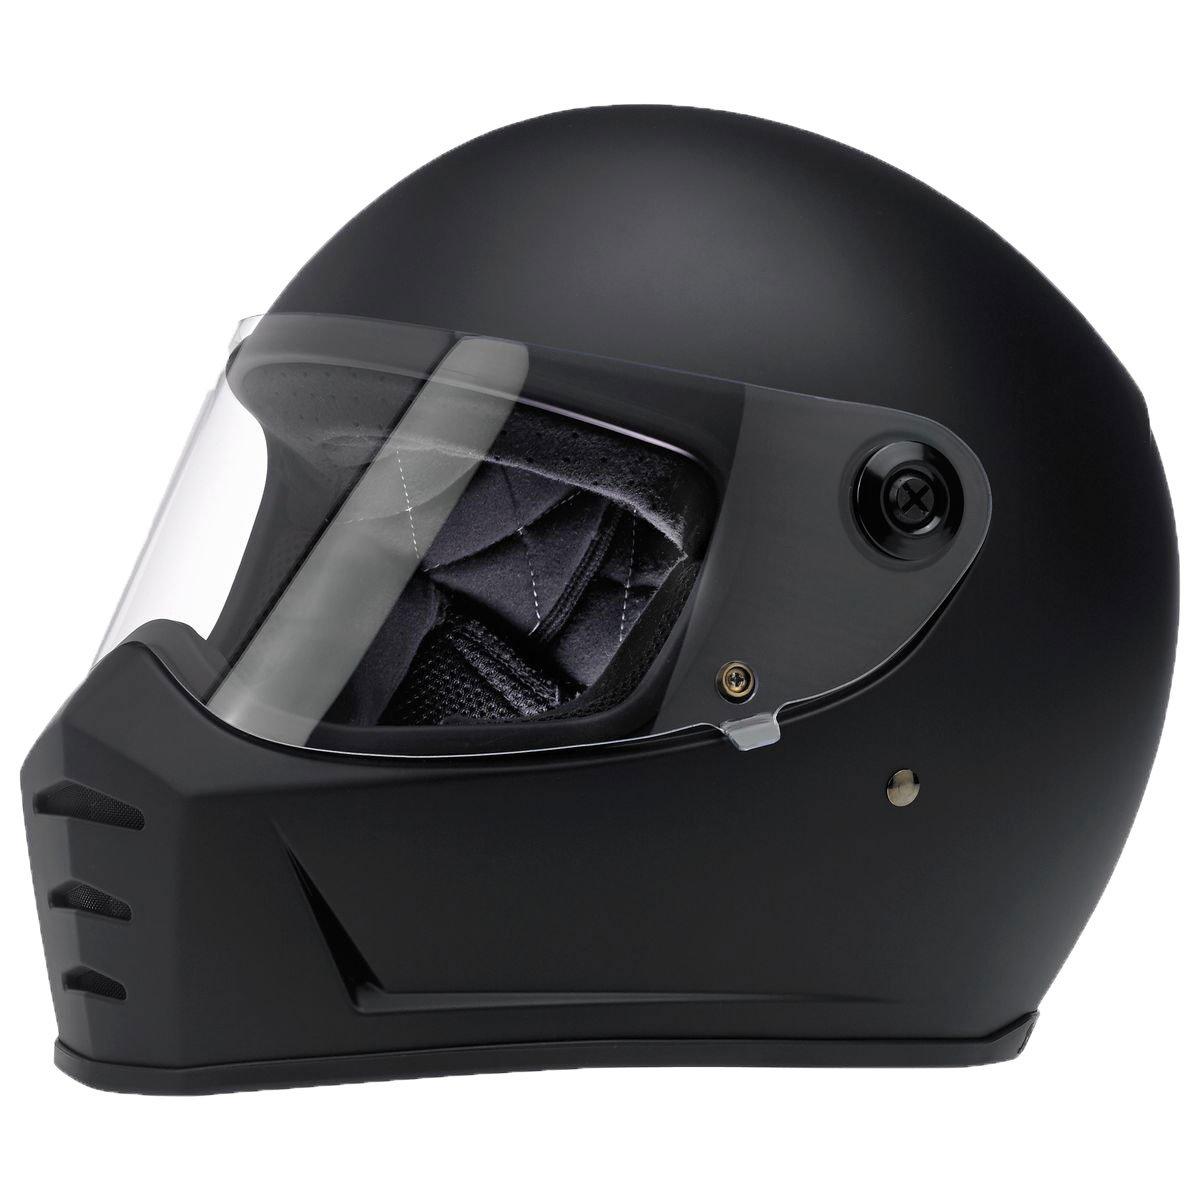 Biltwell Lane Splitter Solid Full-face Motorcycle Helmet - Flat Black / Medium by Biltwell